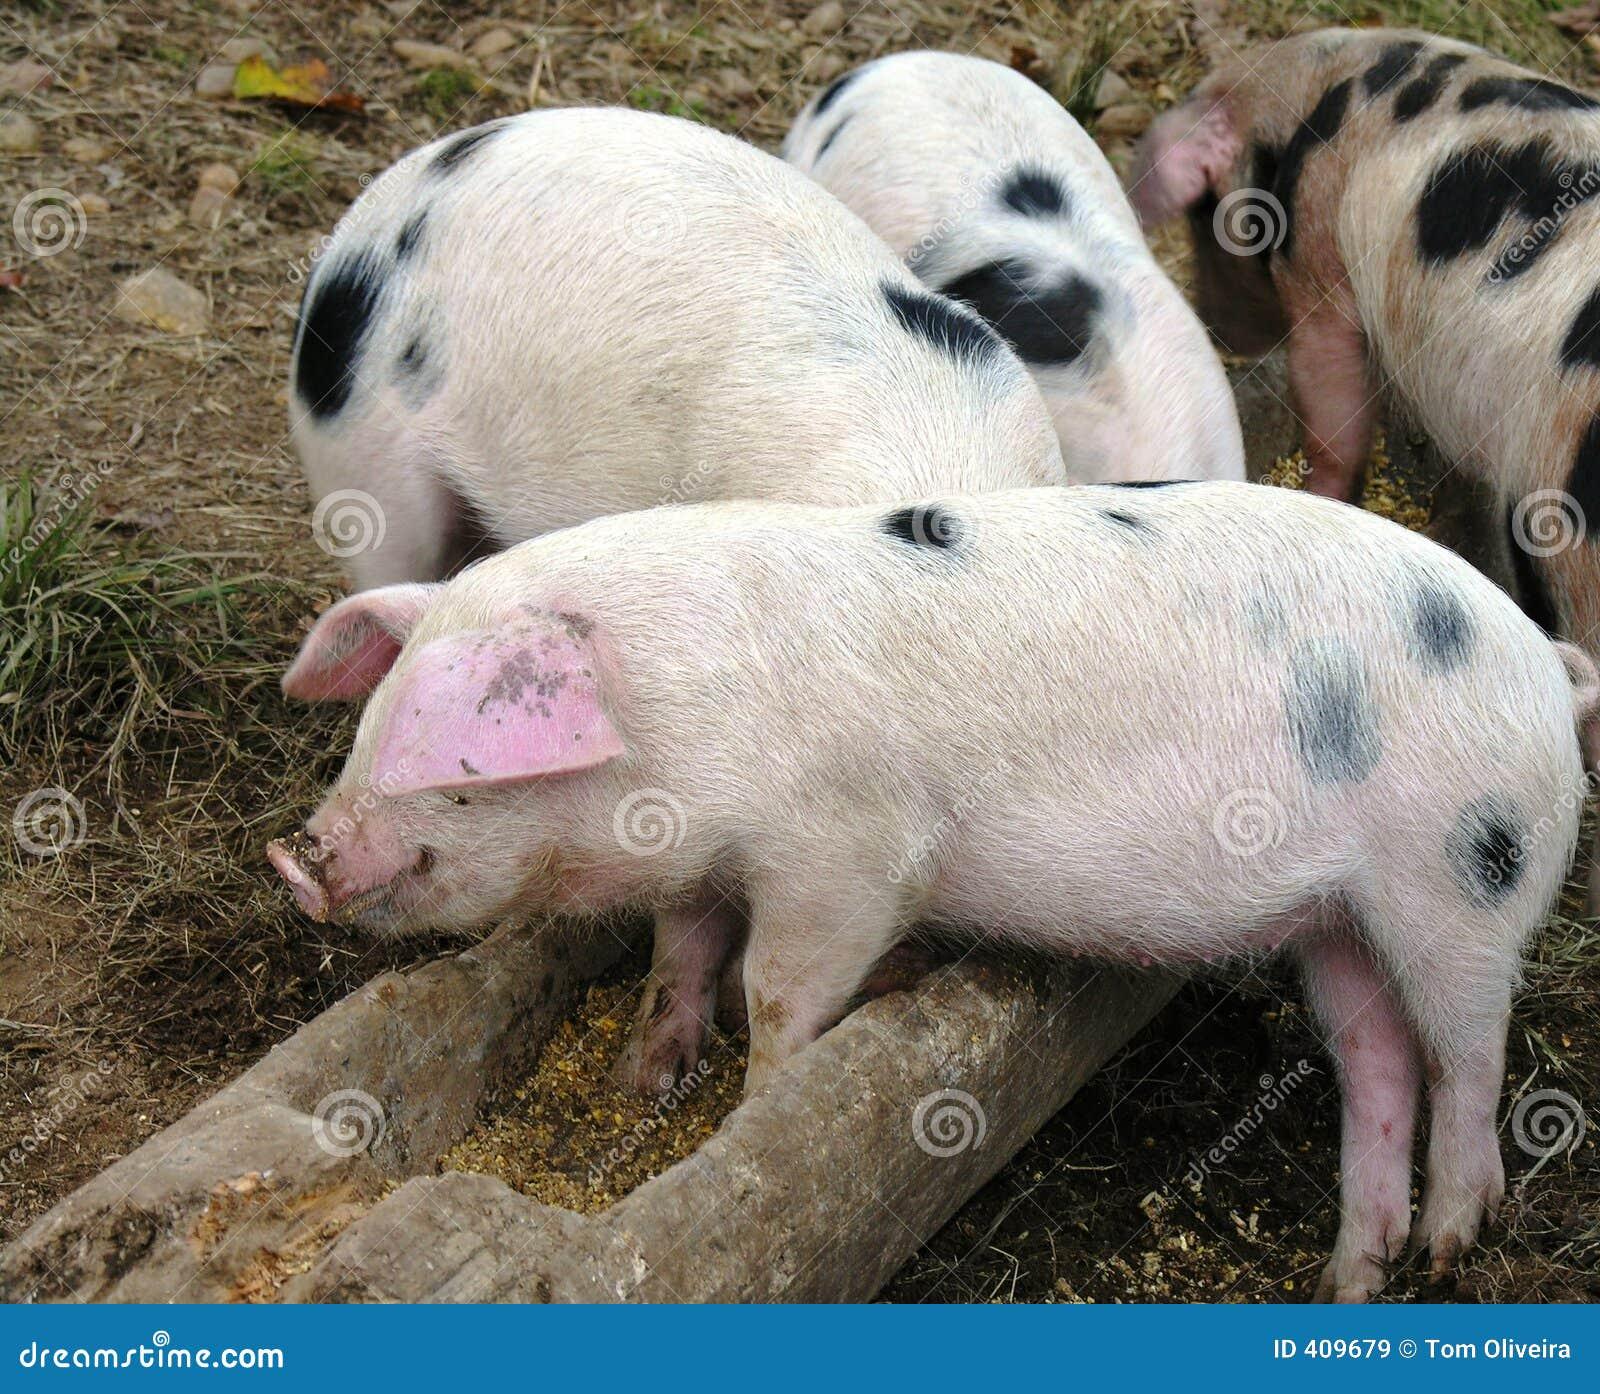 Pigs Feeding time